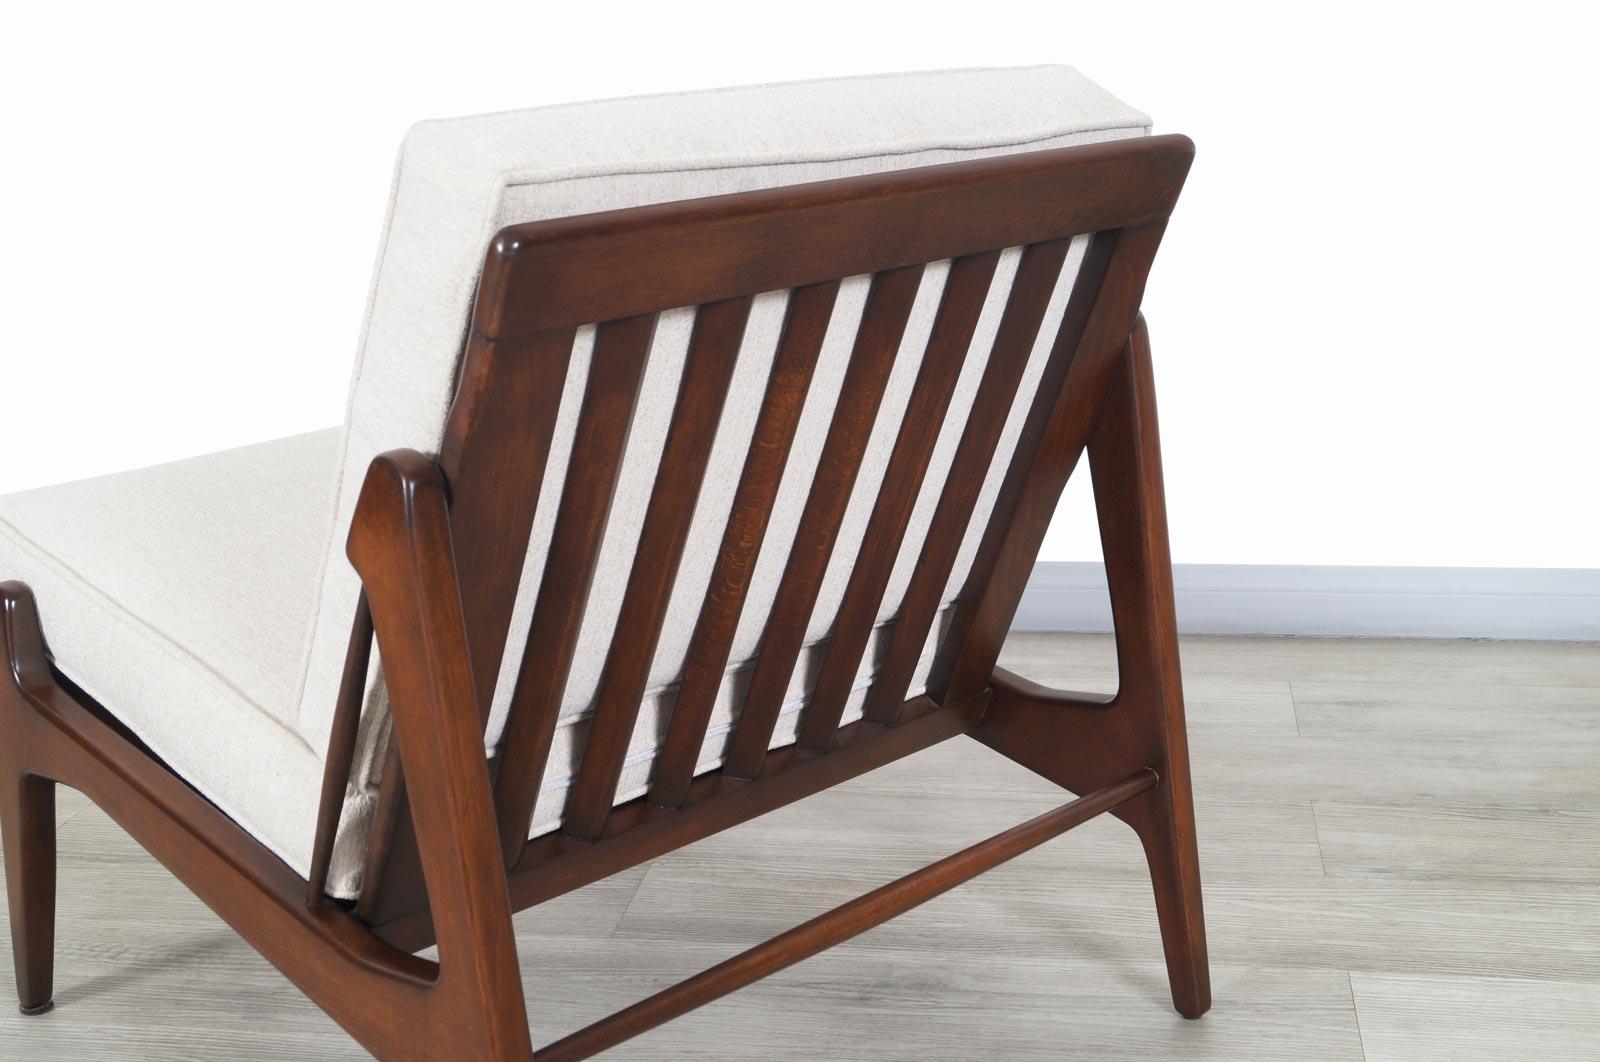 Danish Modern Walnut Slipper Lounge Chairs by Ib Kofod Larsen